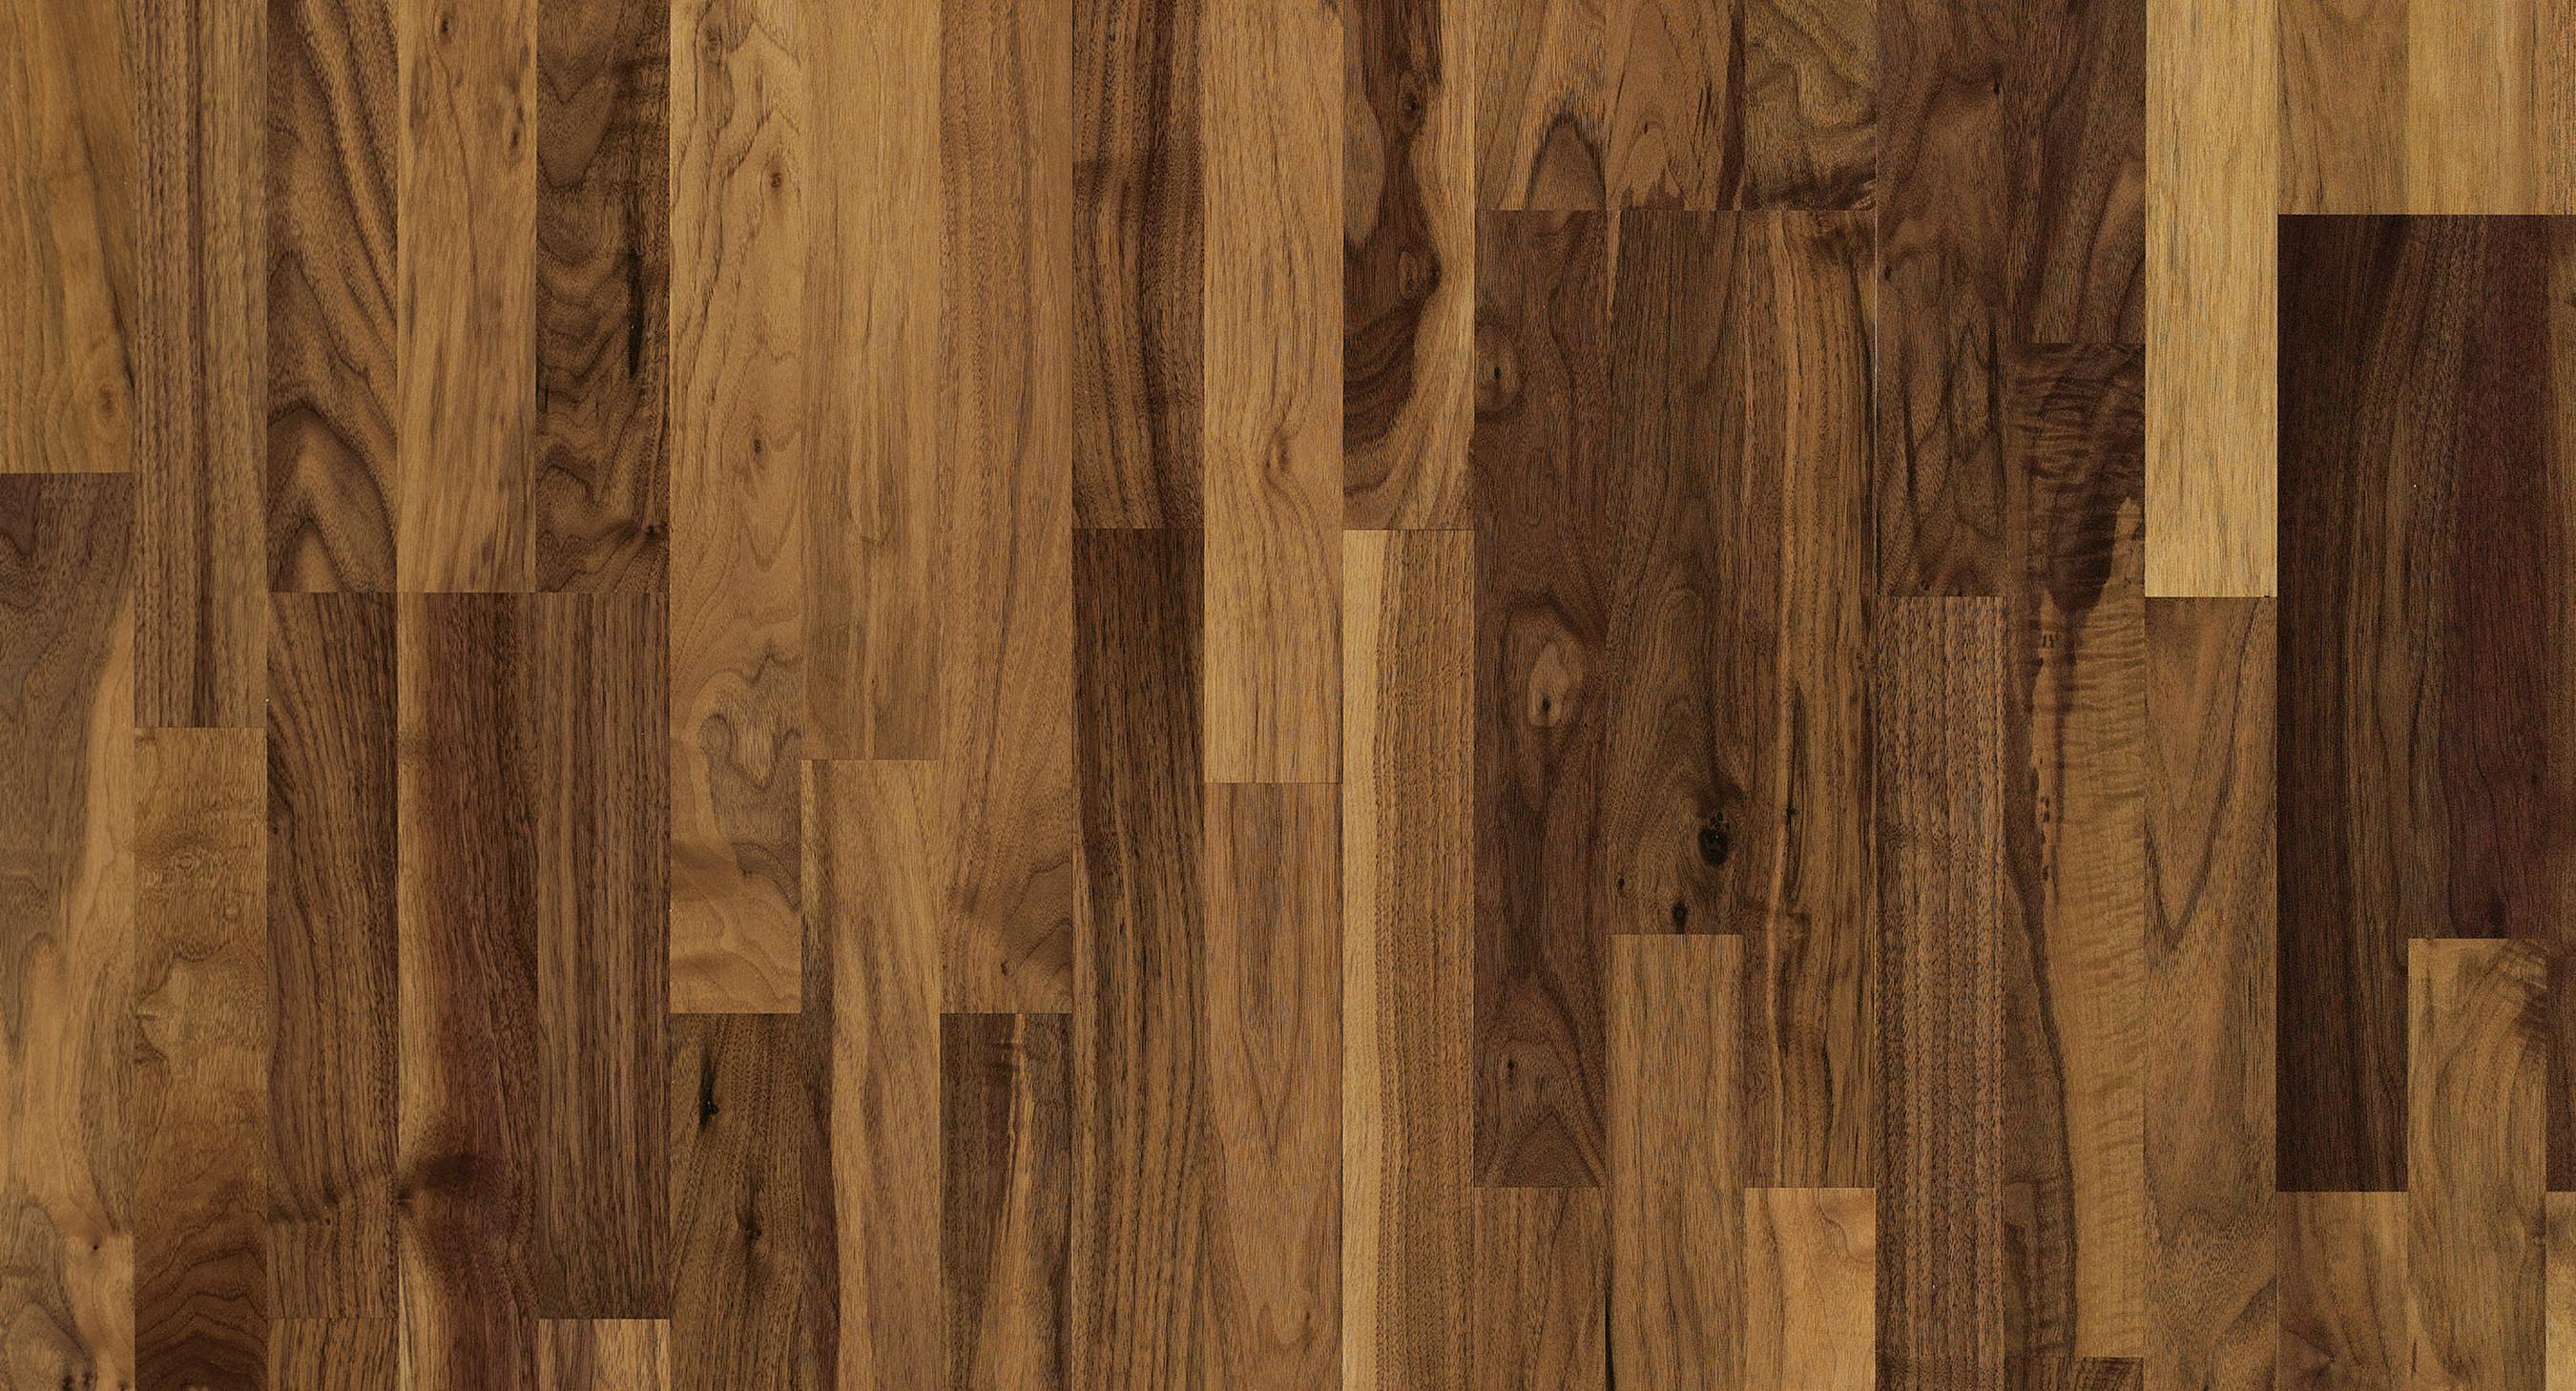 3 engineered hardwood flooring of basic engineered wood flooring products parador throughout 45a